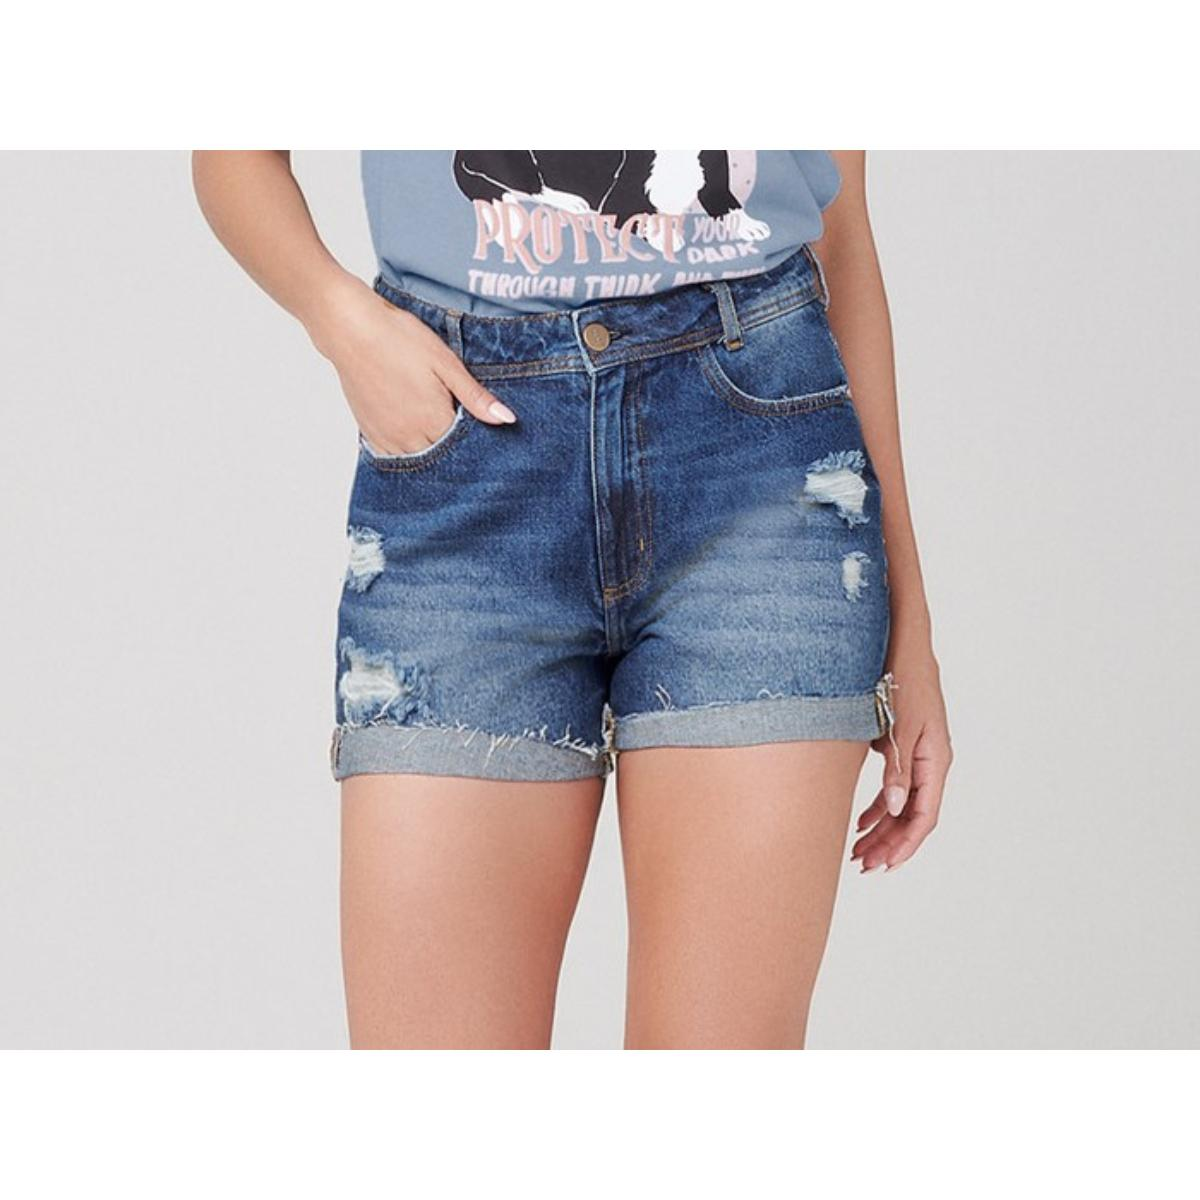 Short Feminino Dzarm Zc4l 1asn  Jeans